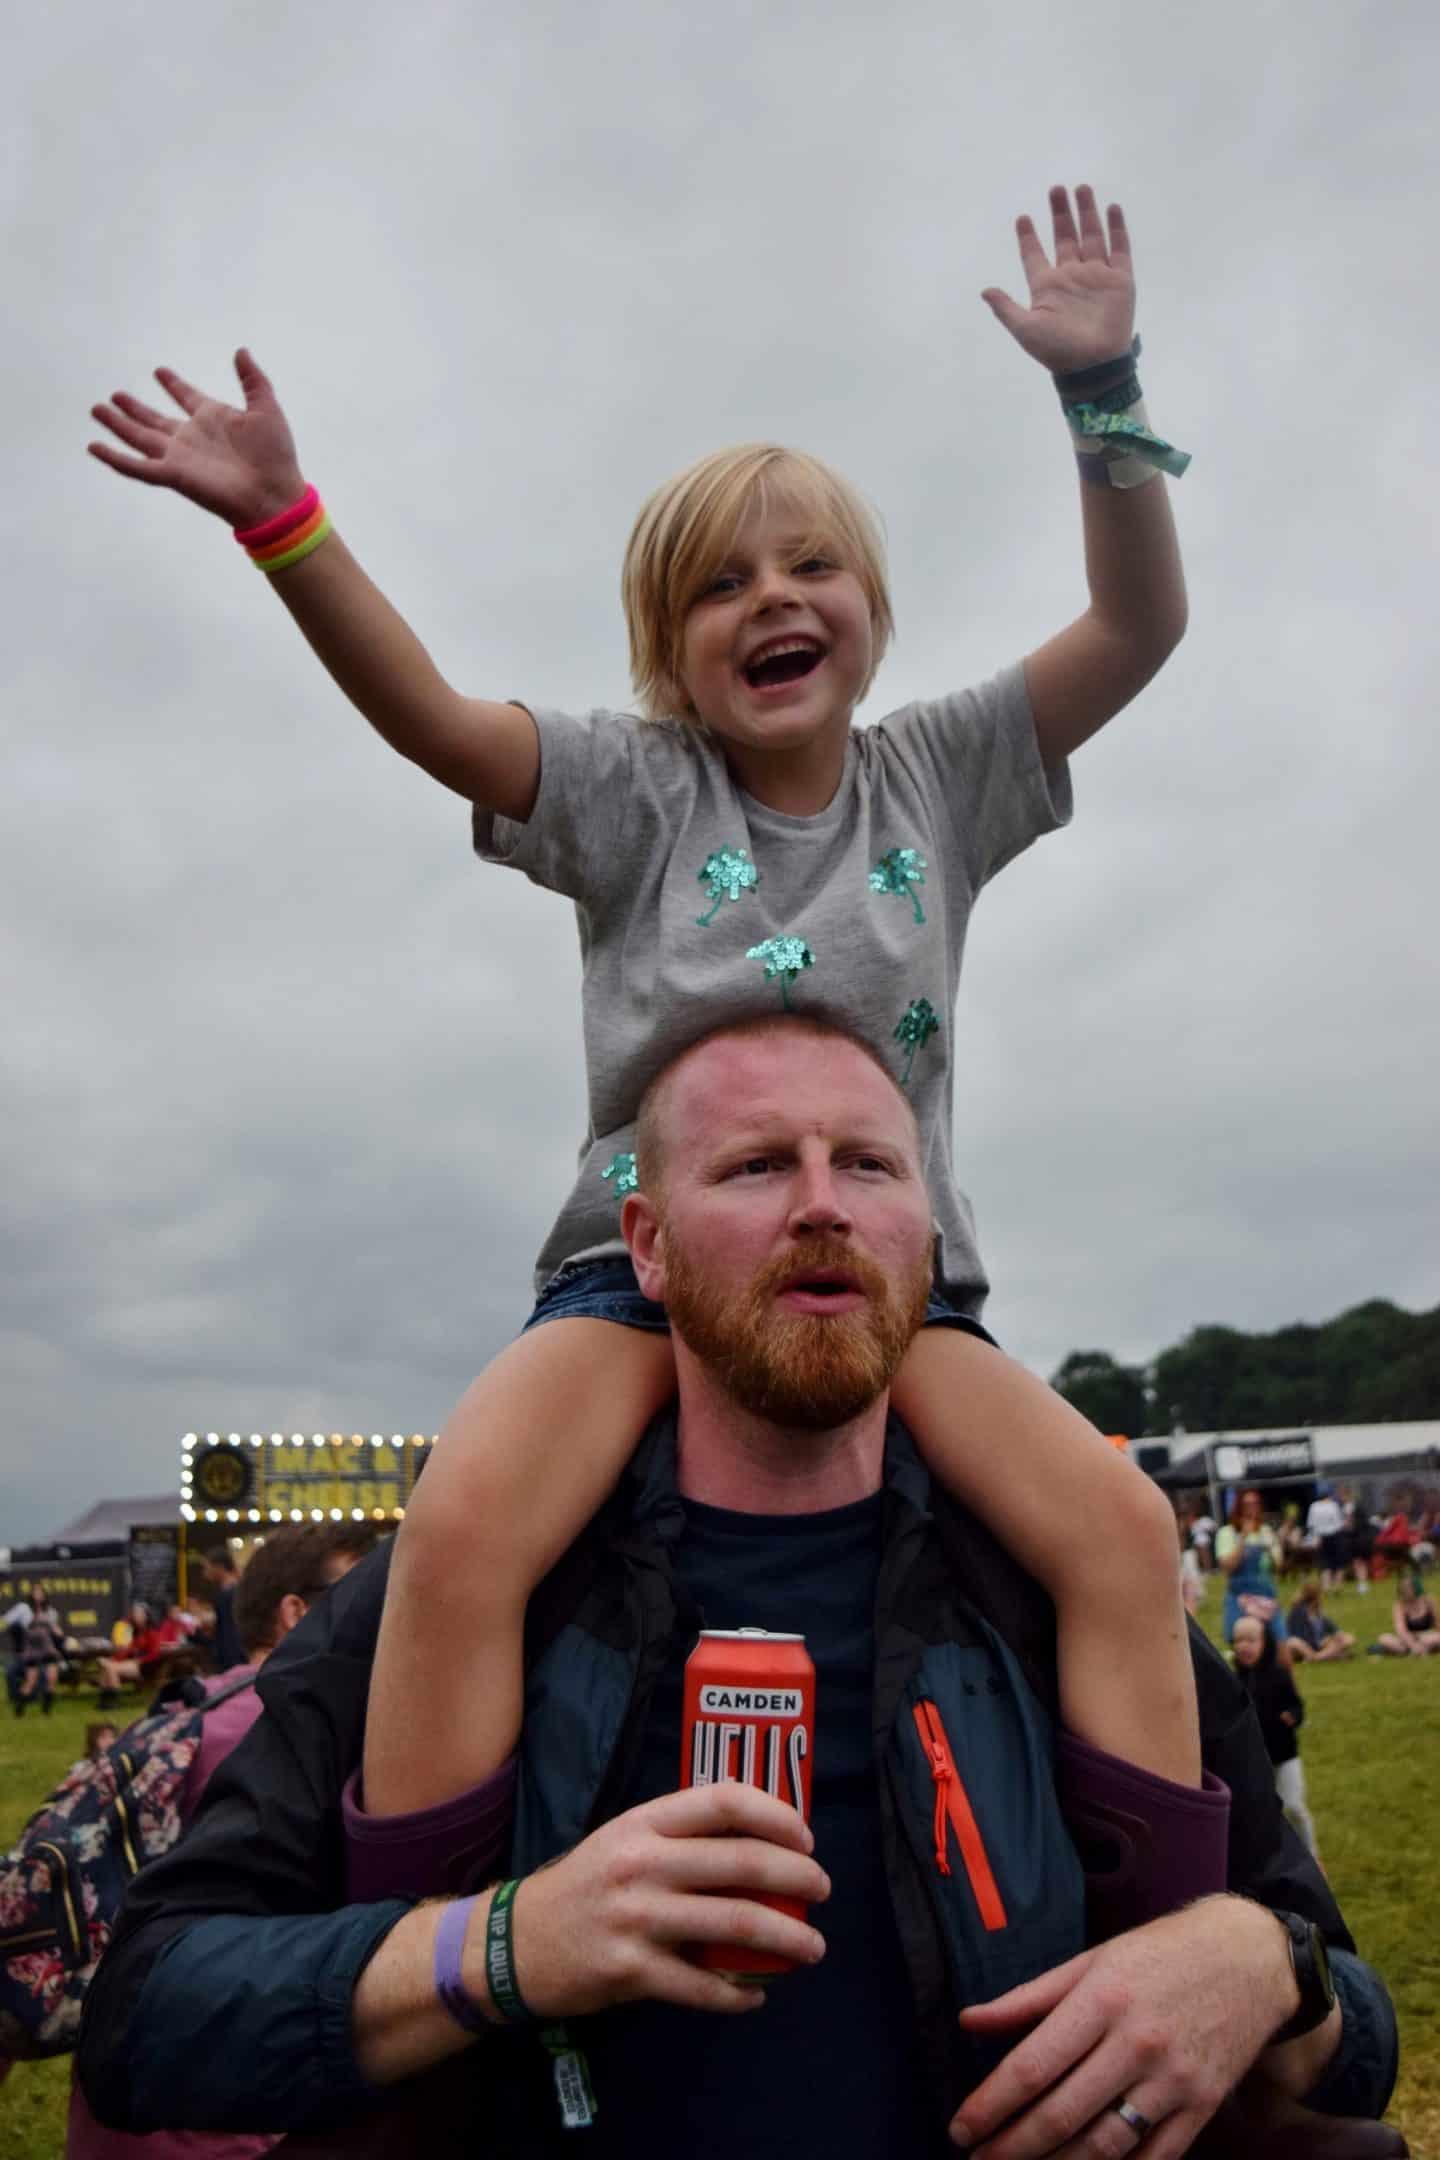 Little girl sat on her Dad's shoulders at a festival